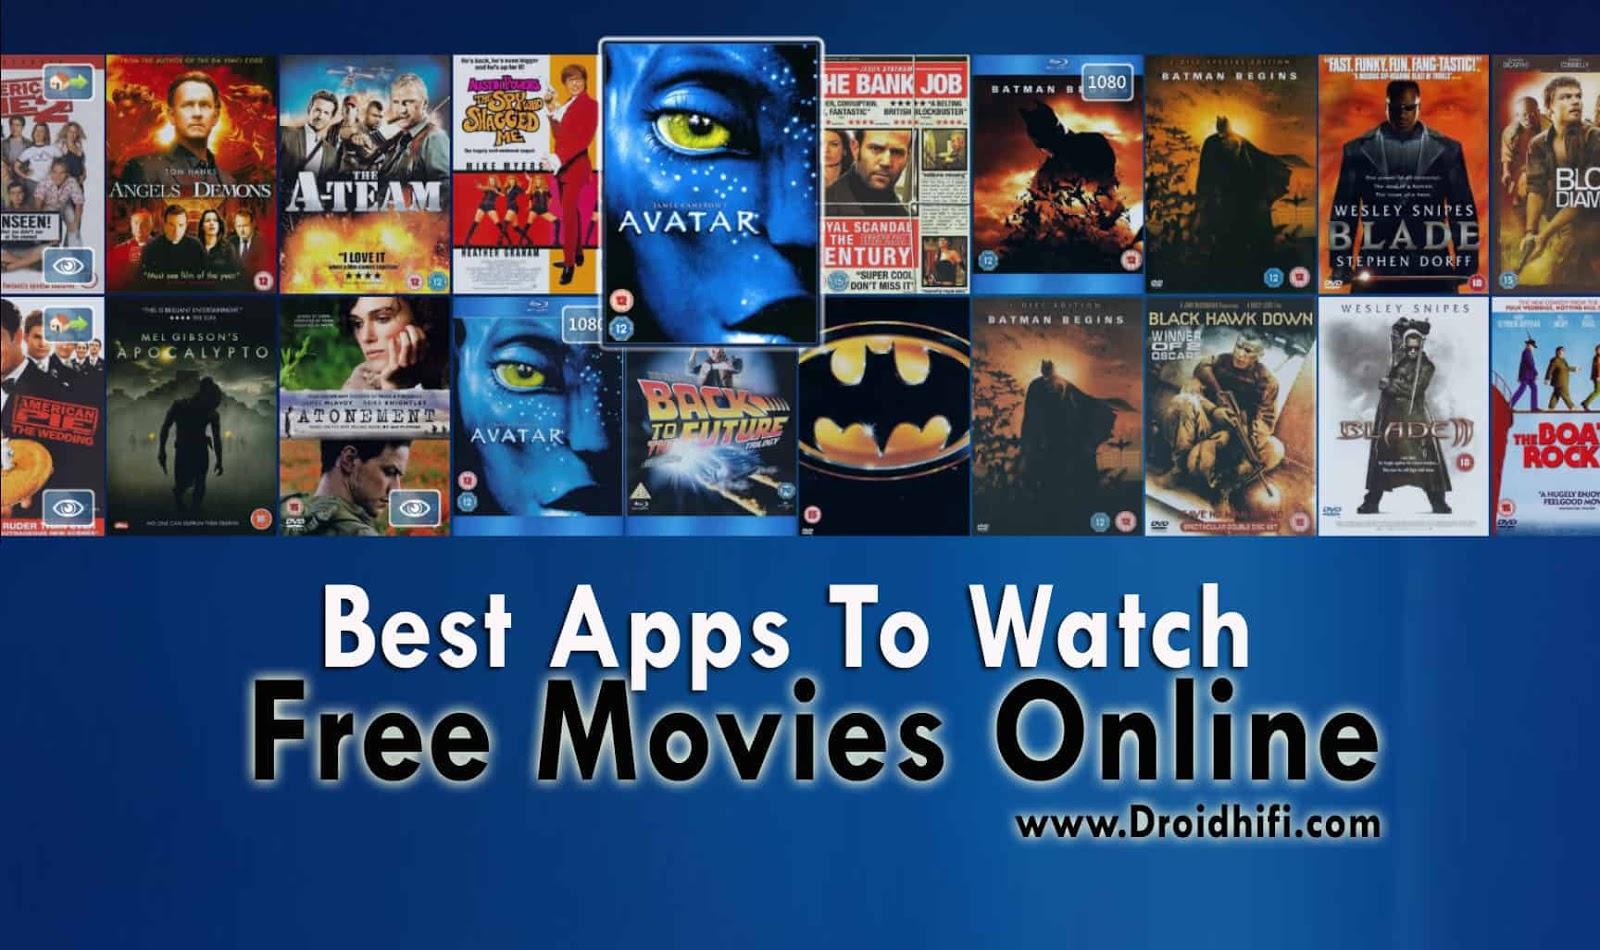 Best Apps To Watch Free Movies Online - Updated 2019